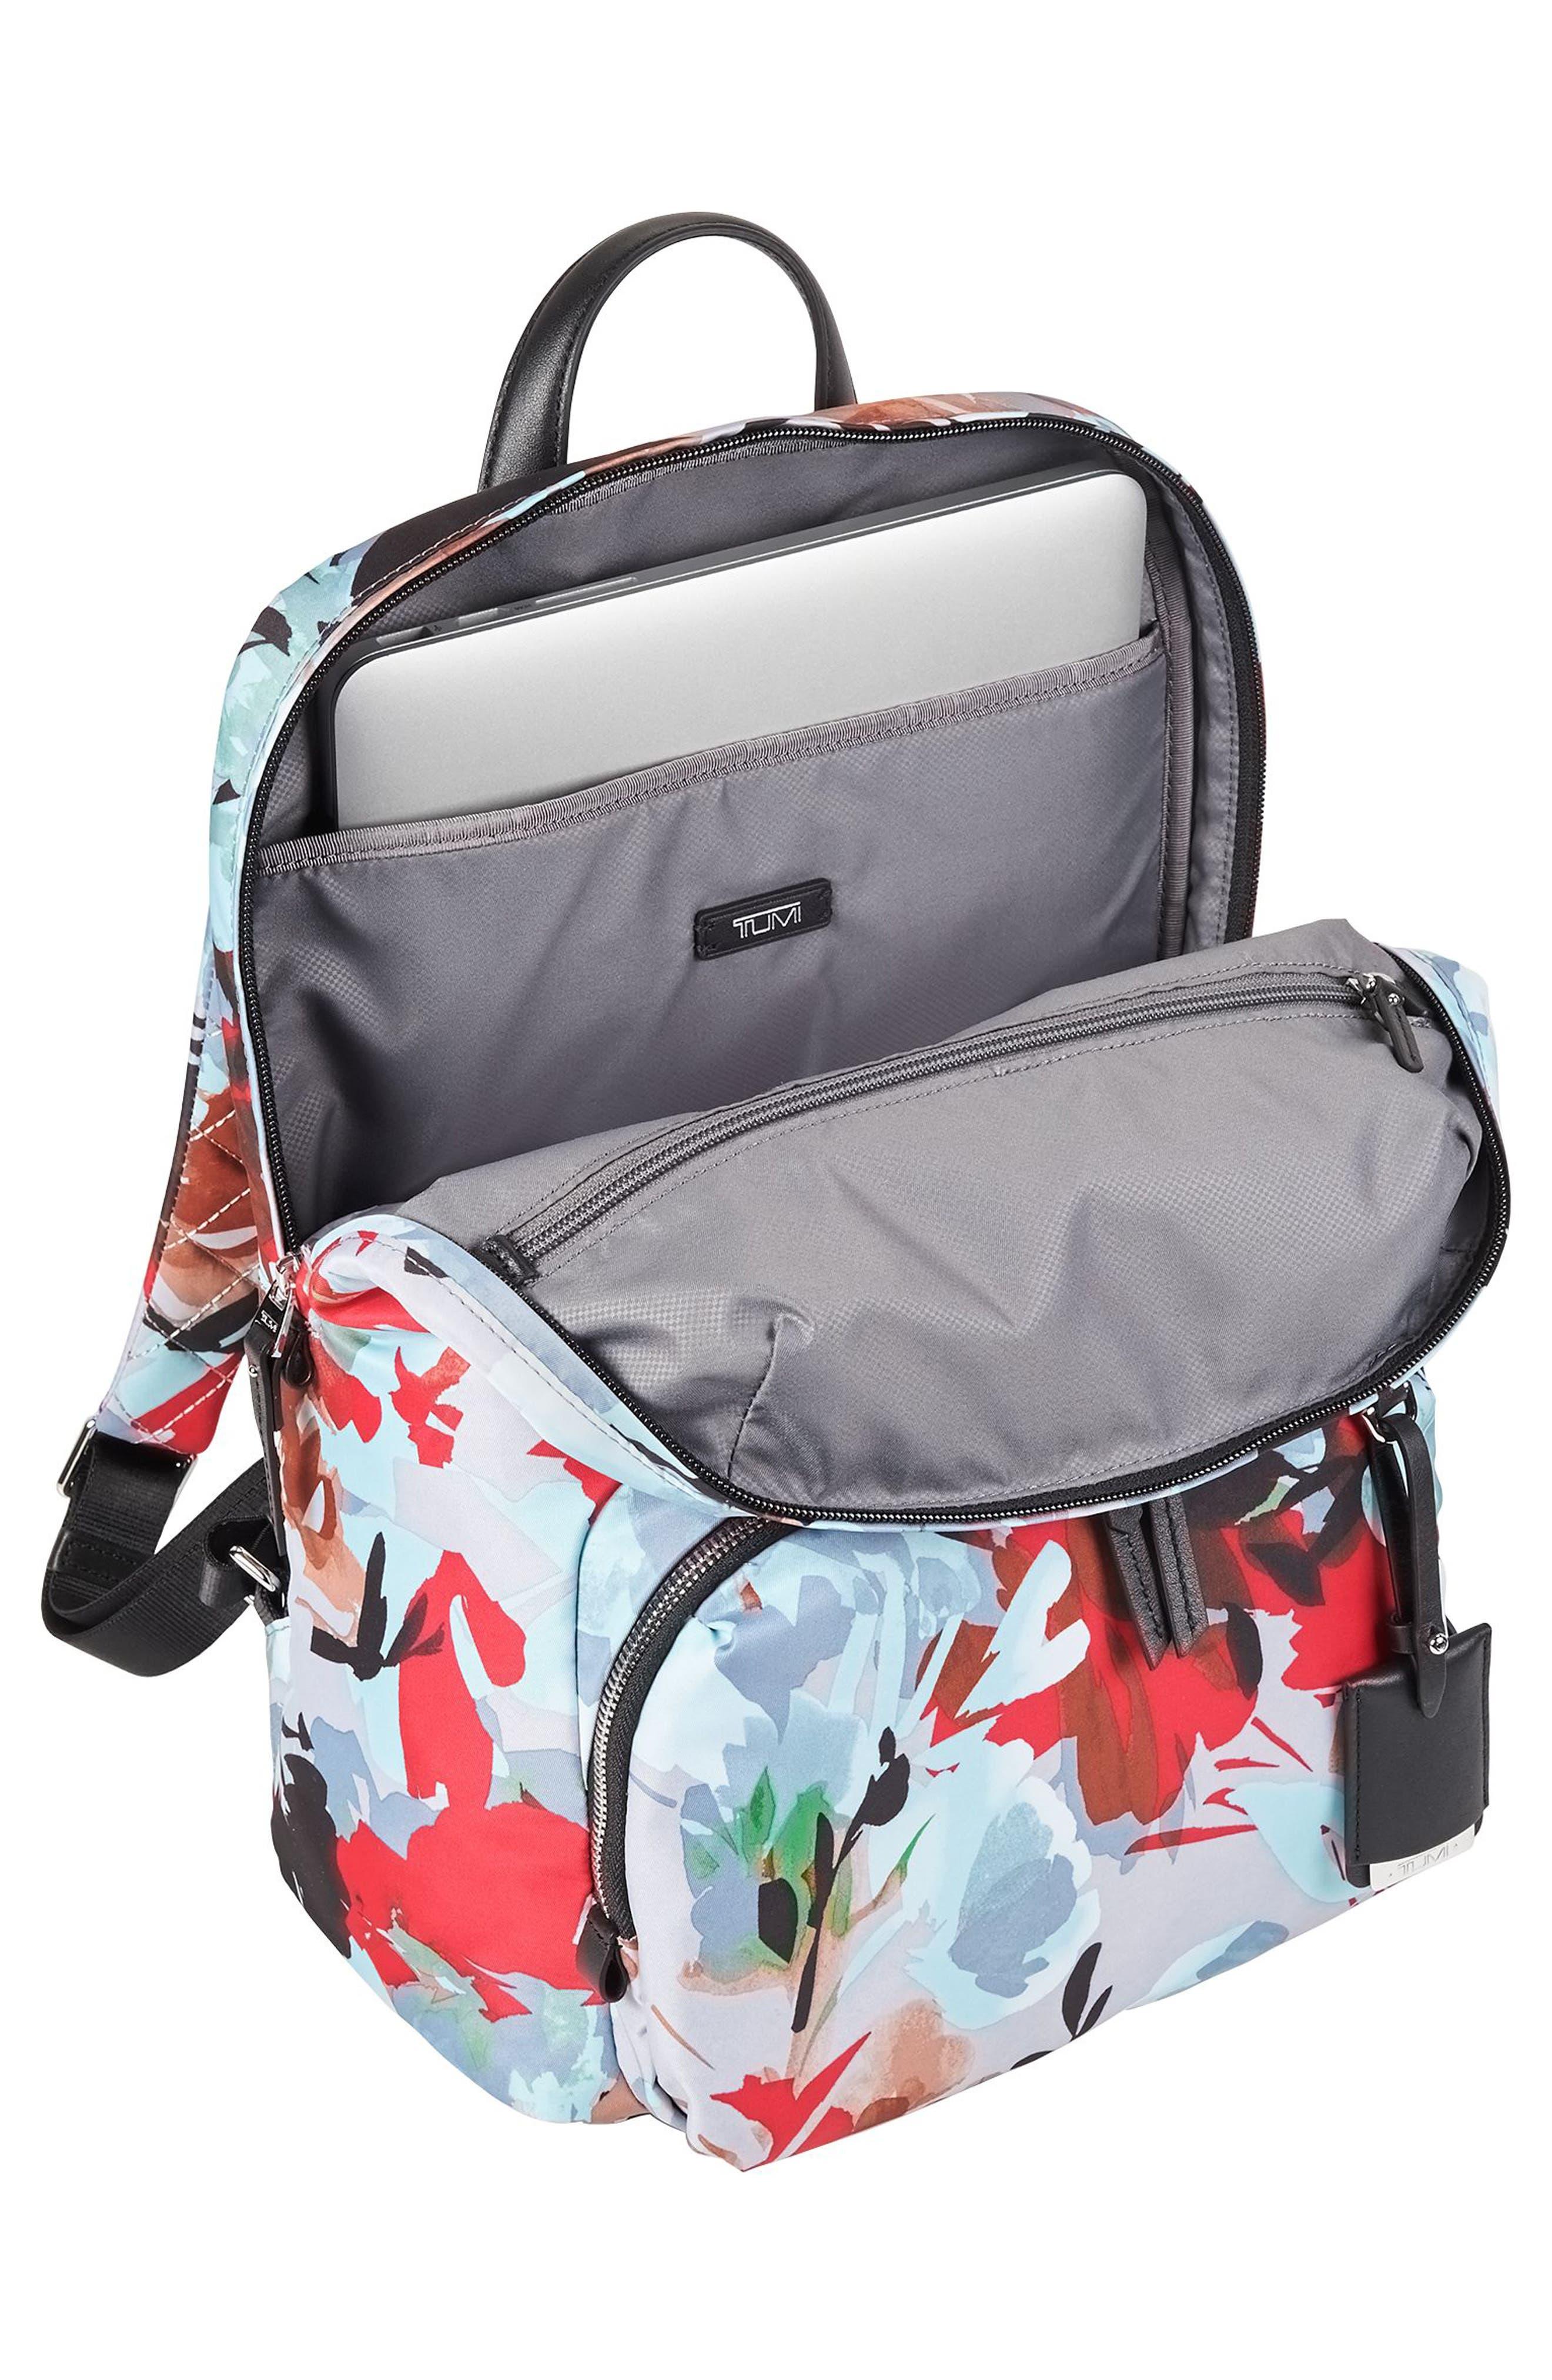 Voyageur Halle Nylon Backpack,                             Alternate thumbnail 4, color,                             Pacific Floral